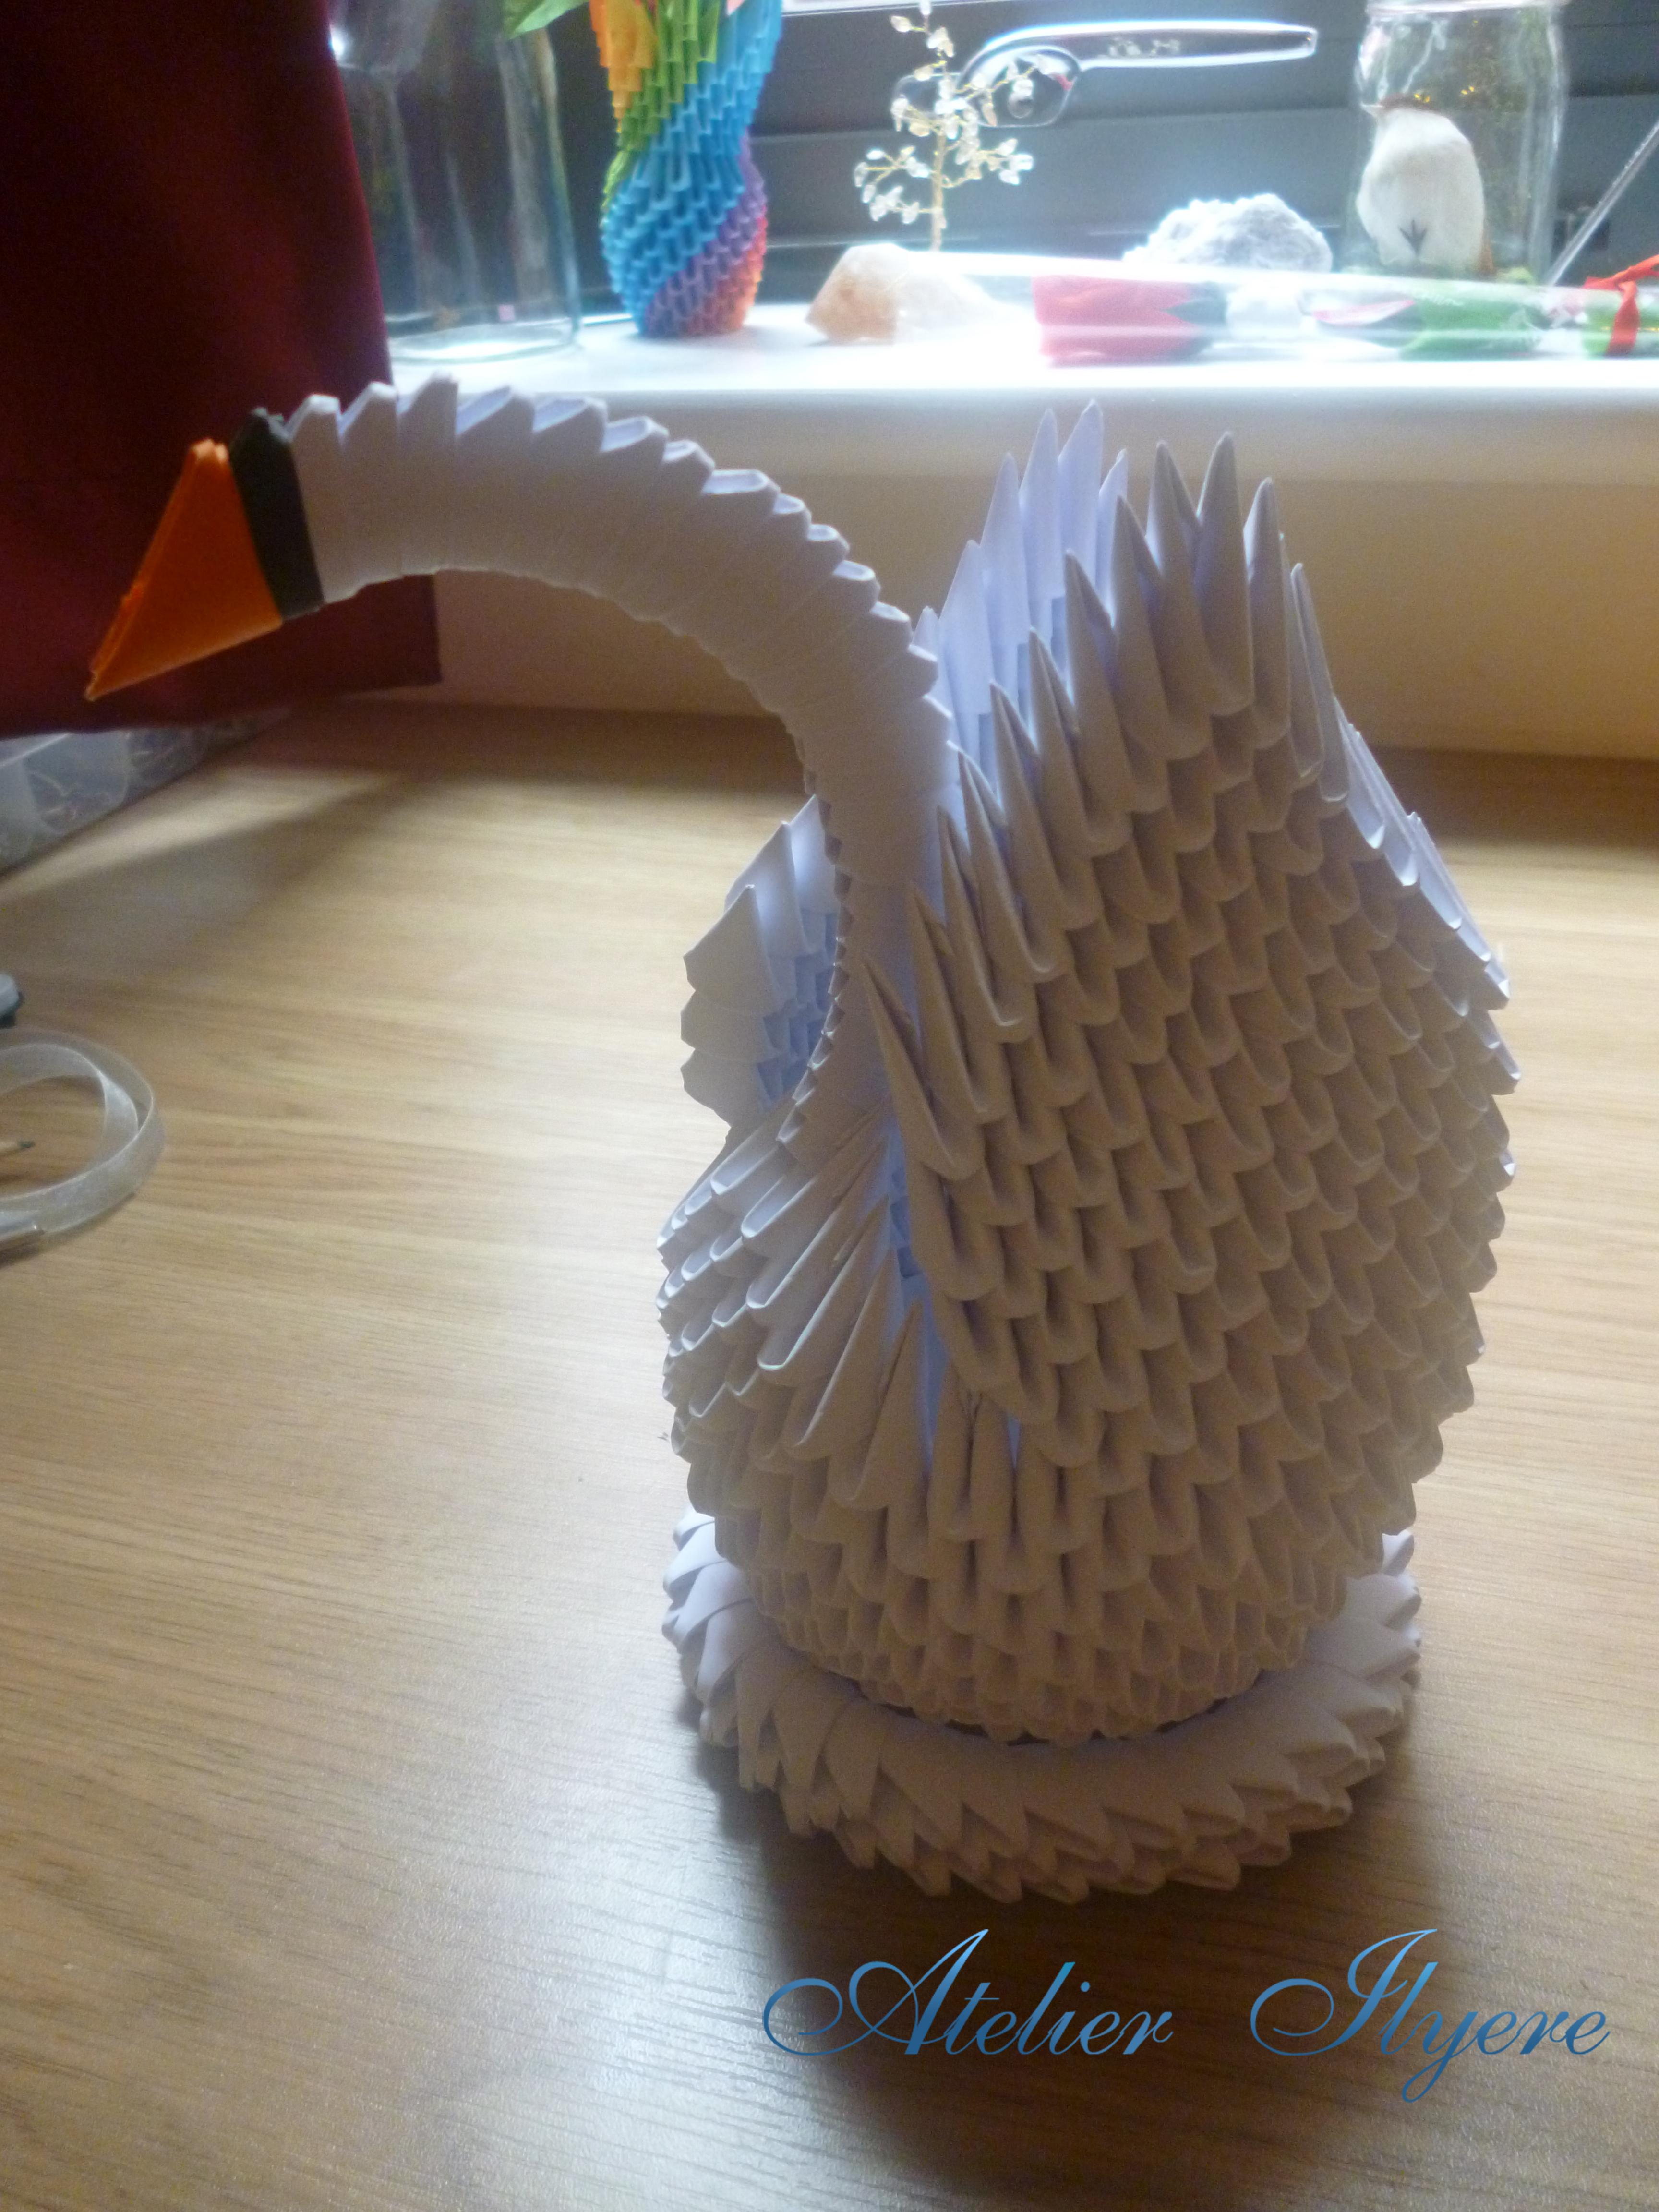 3D Origami | Kathy May & Silas | 4608x3456